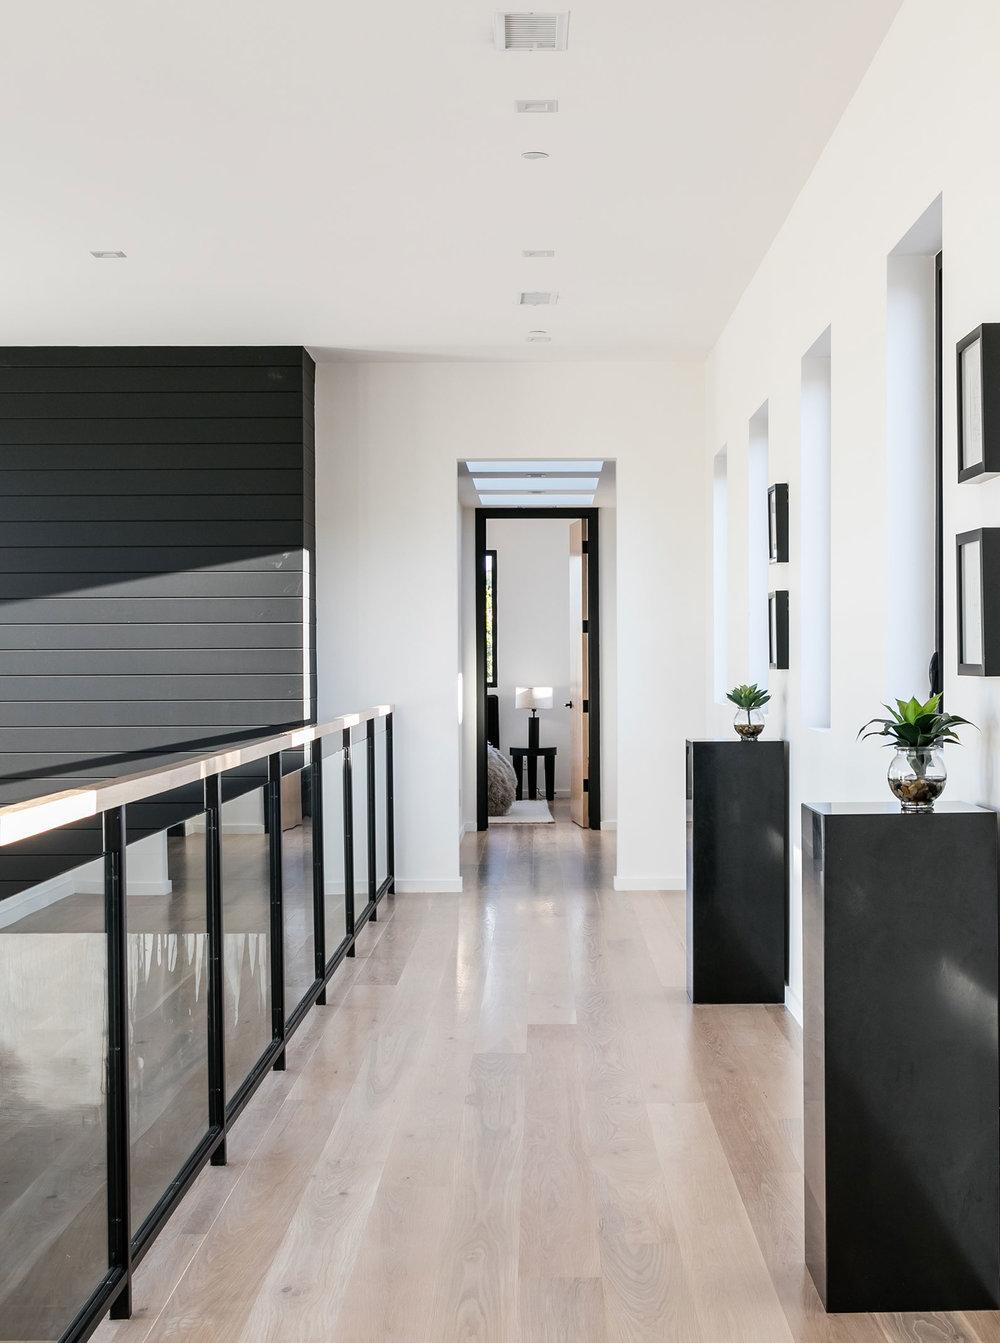 7-SiliconBay-contemporary-architecture-hallway-Losangeles.jpg